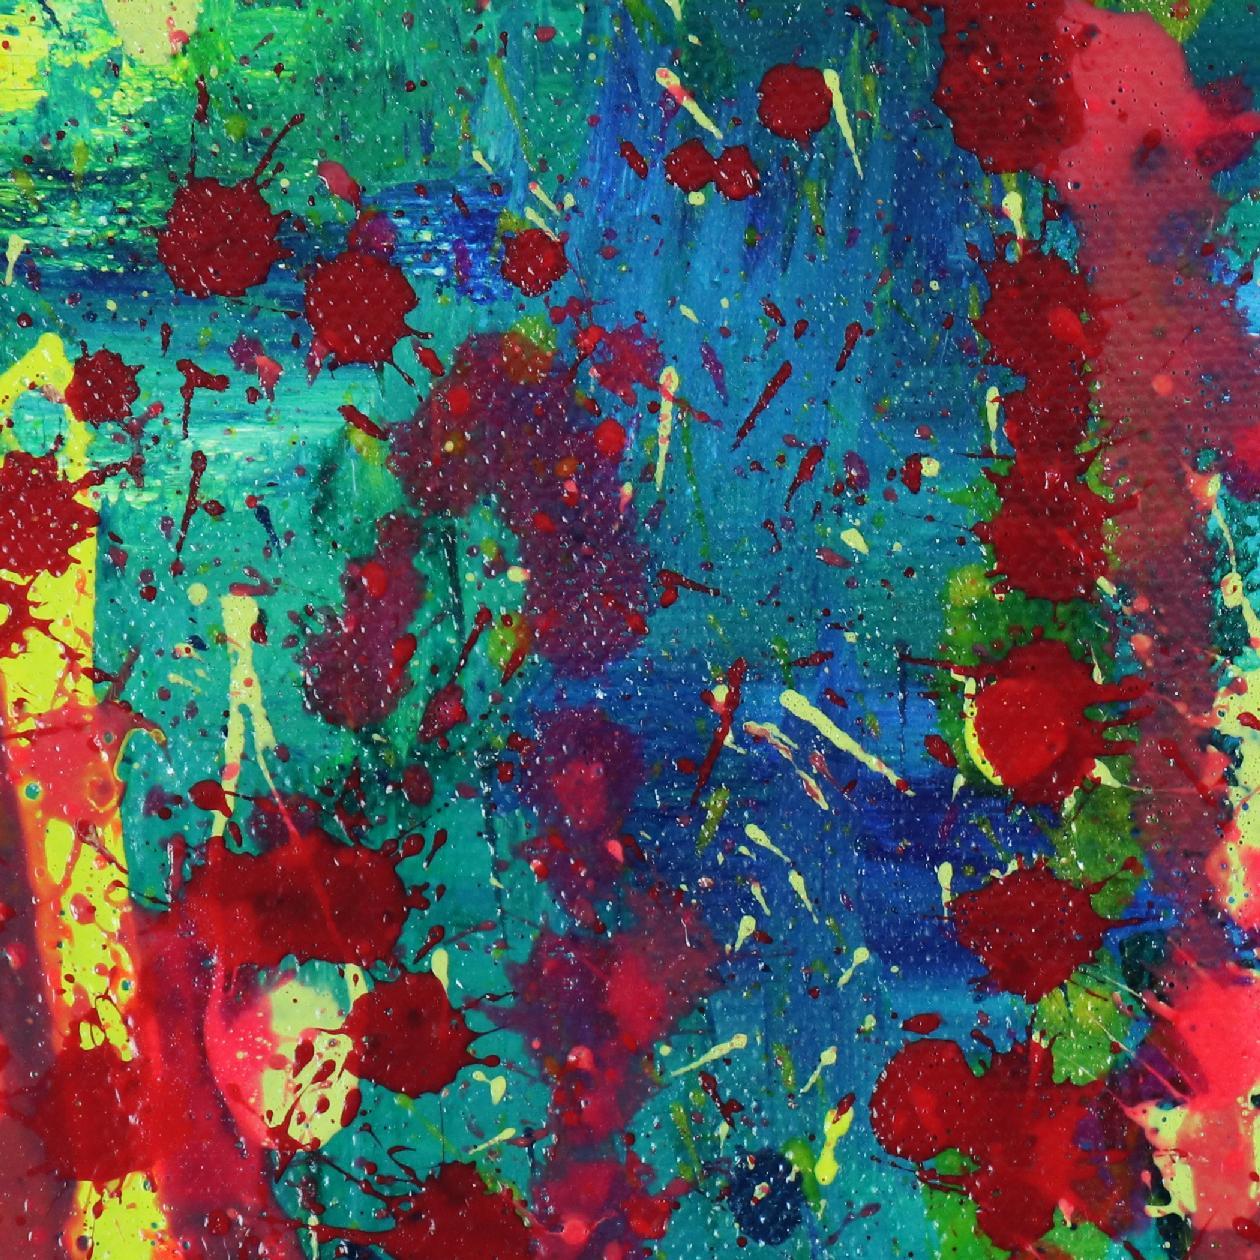 Detail - Prophesy Garden (2020) by Nestor Toro